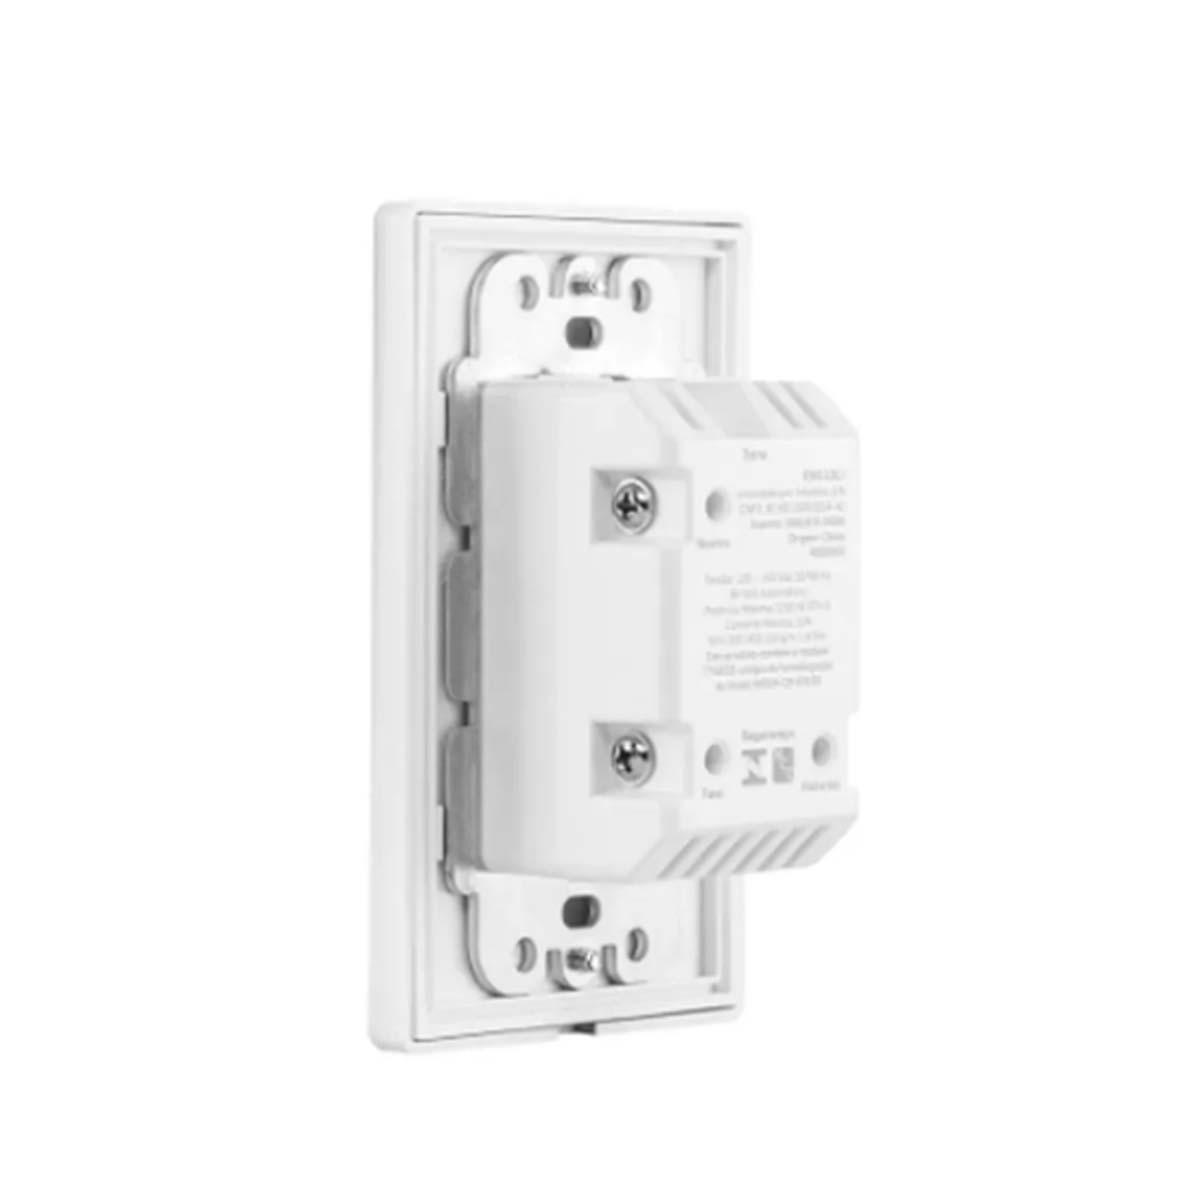 Kit 08 Interruptor Inteligente Intelbras Wi-Fi Ews 101 I